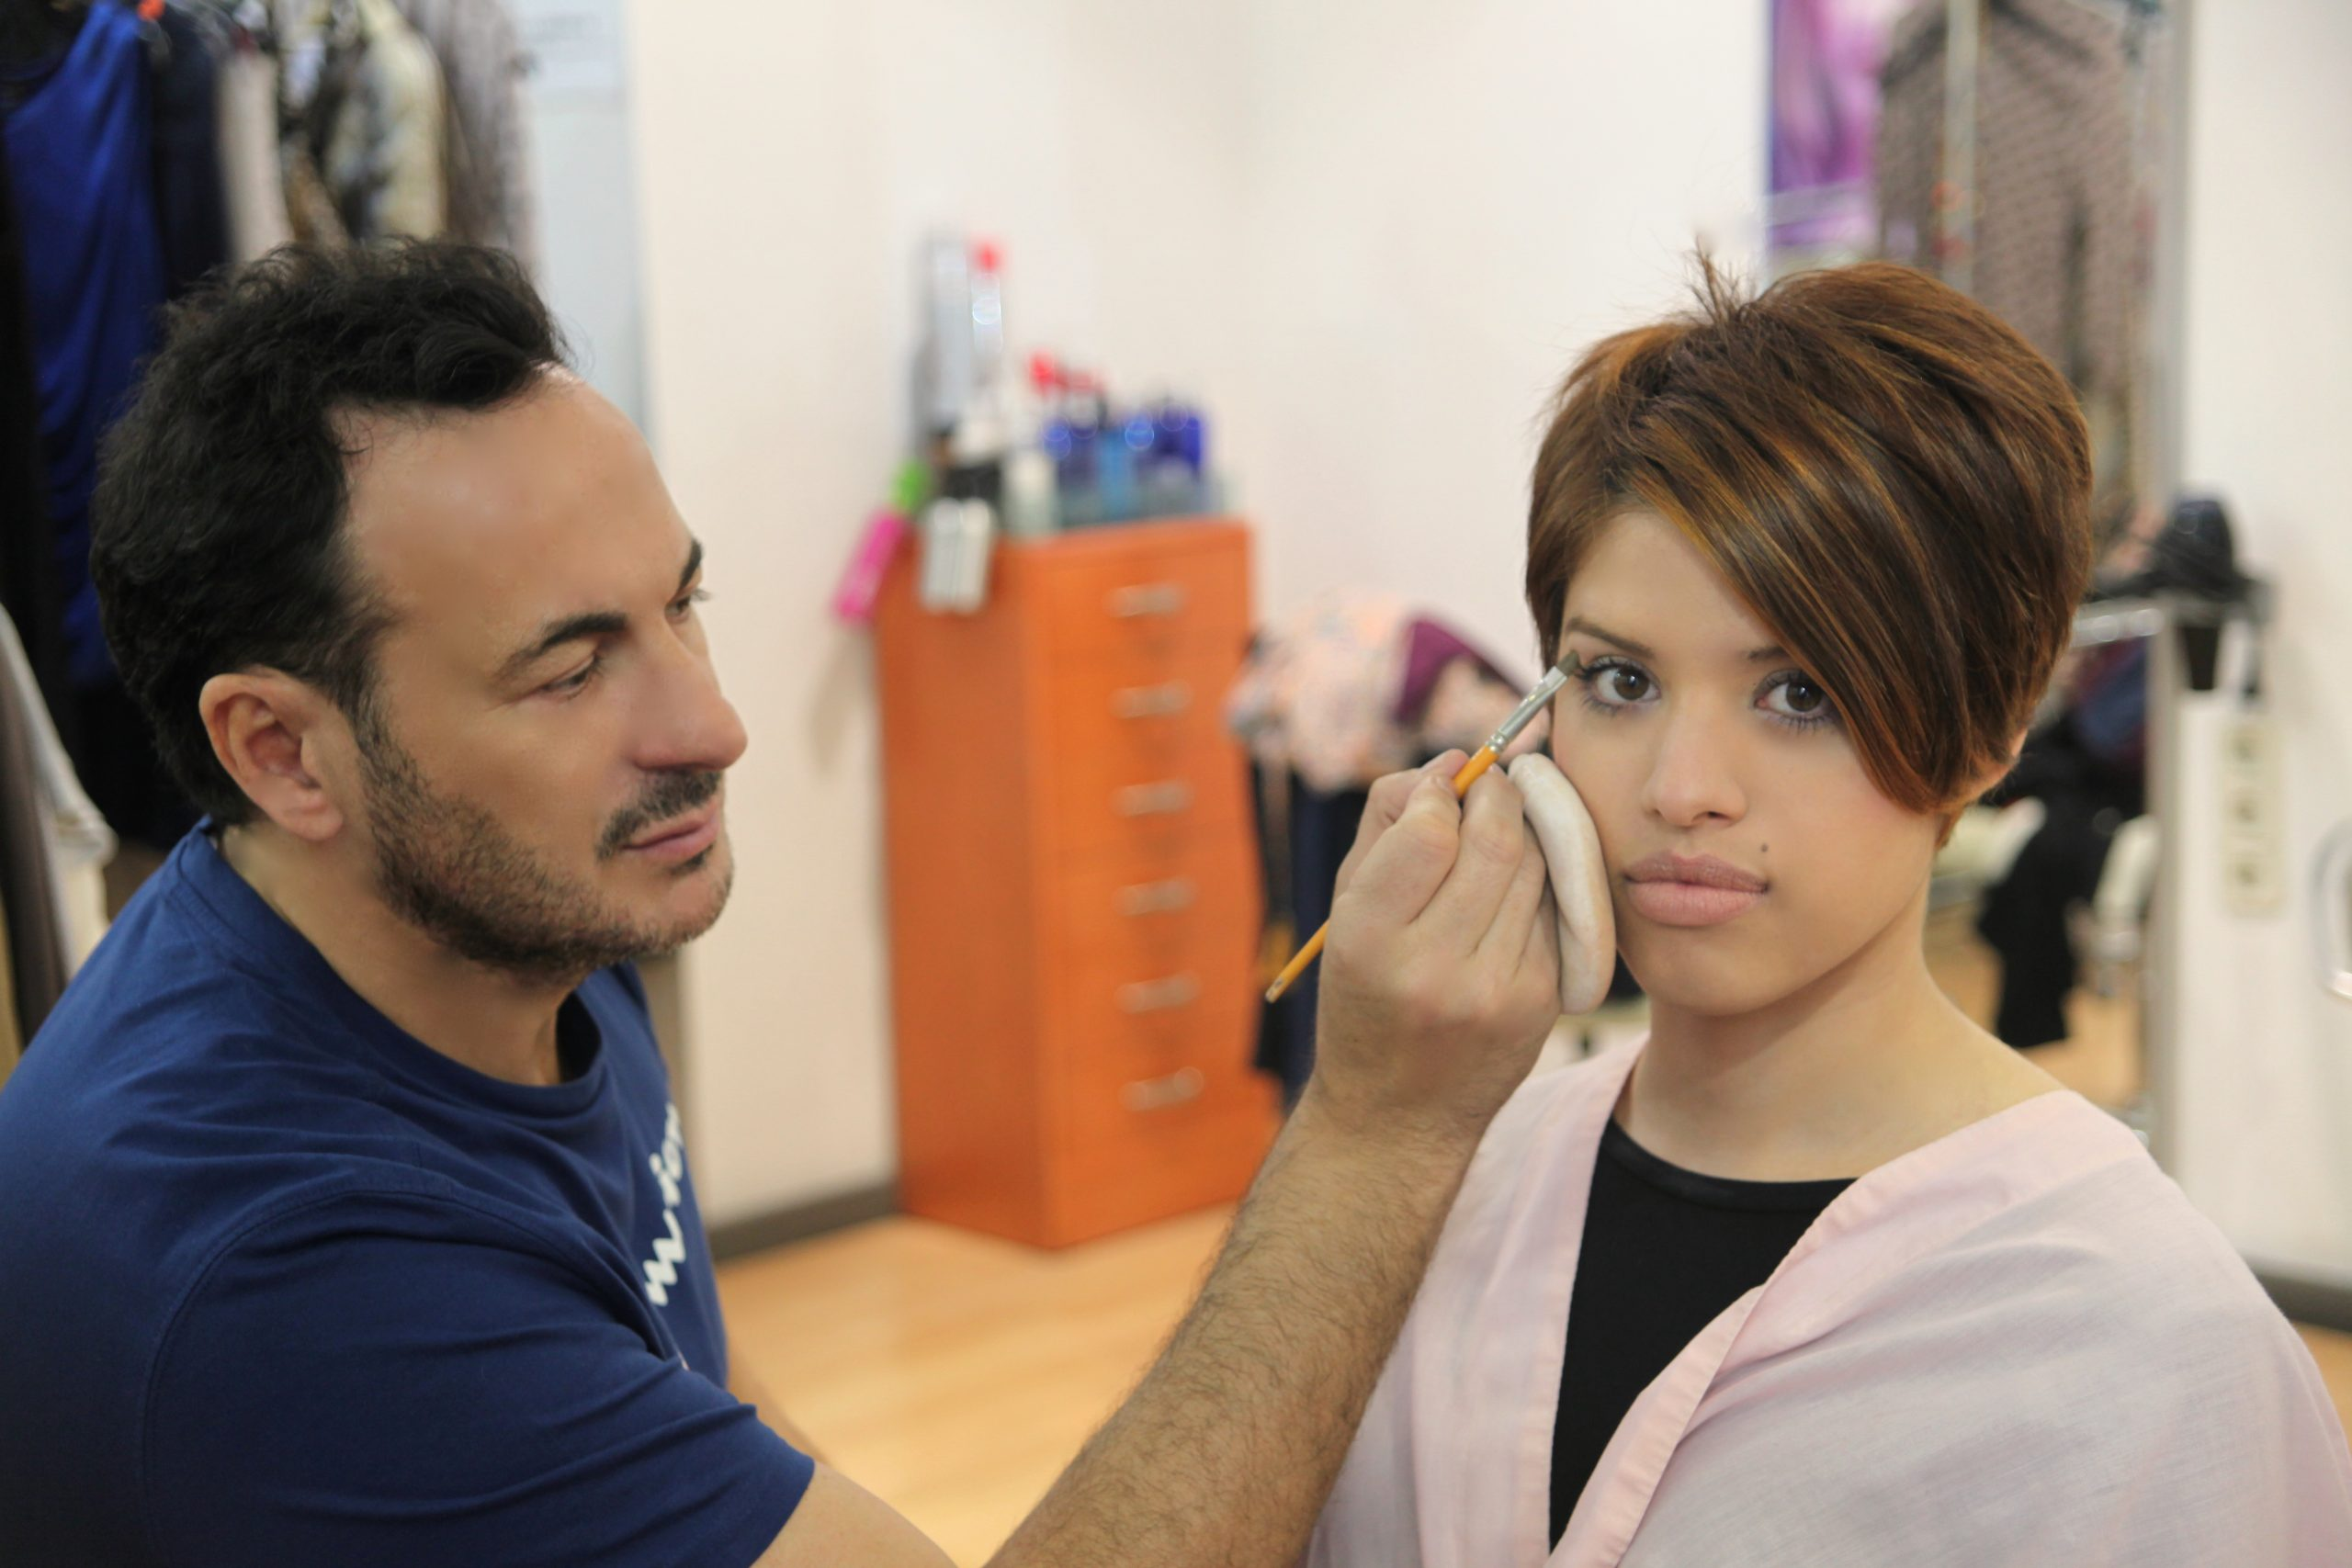 javier-ruiz-maquillando